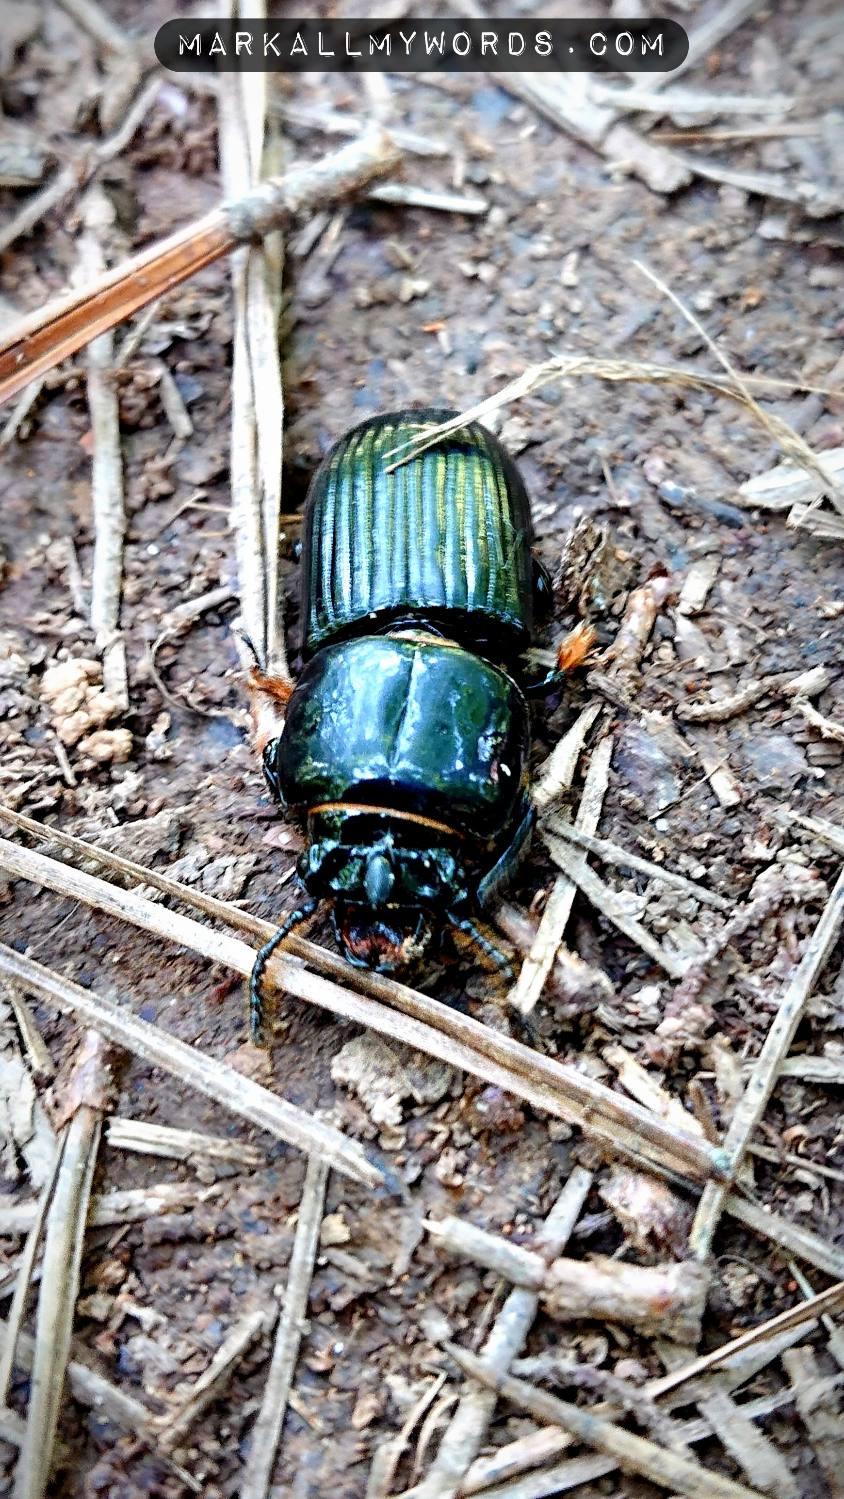 Horned passalus beetle (Odontotaenius disjunctus)